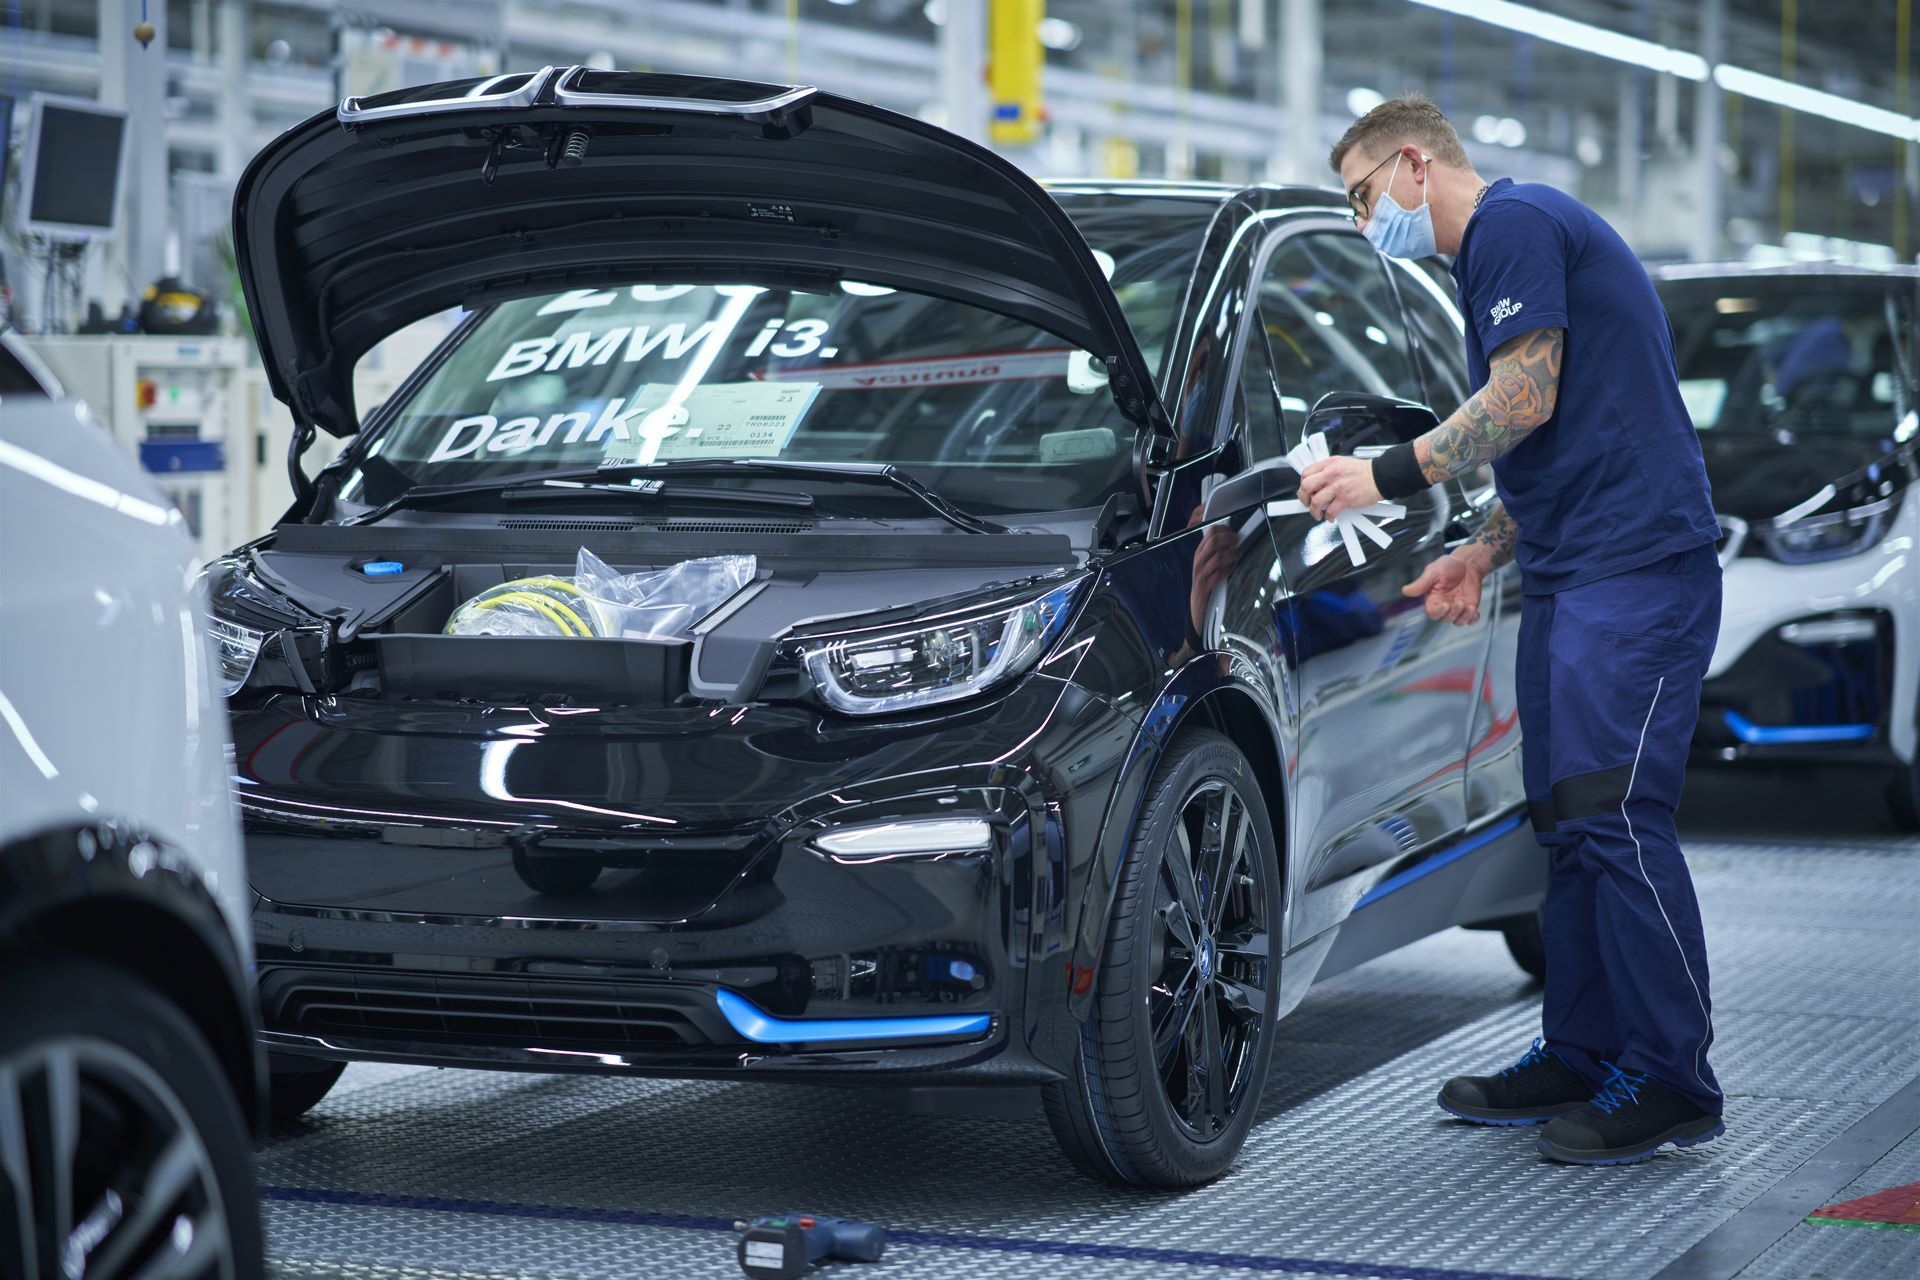 BMW-i8-plant-production-47